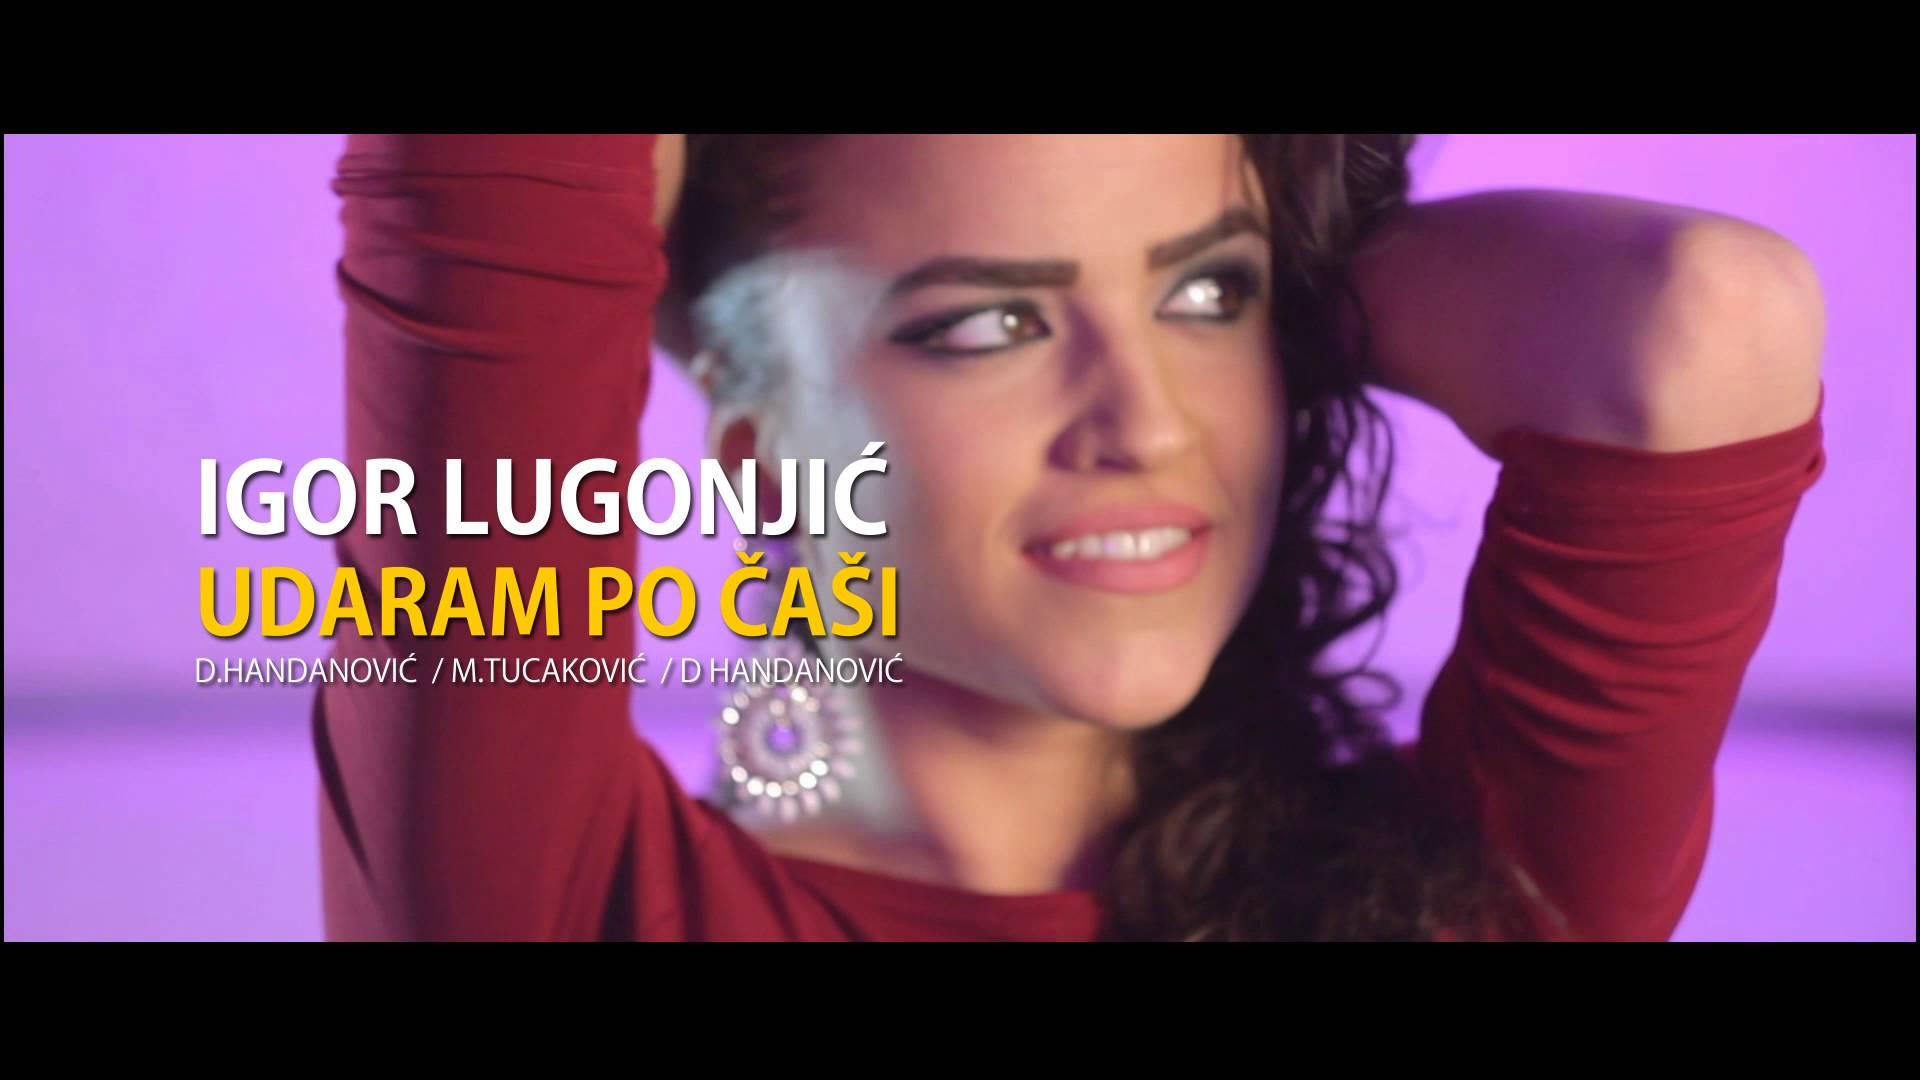 Igor Lugonjic - 2016 - Udaram Po Casi